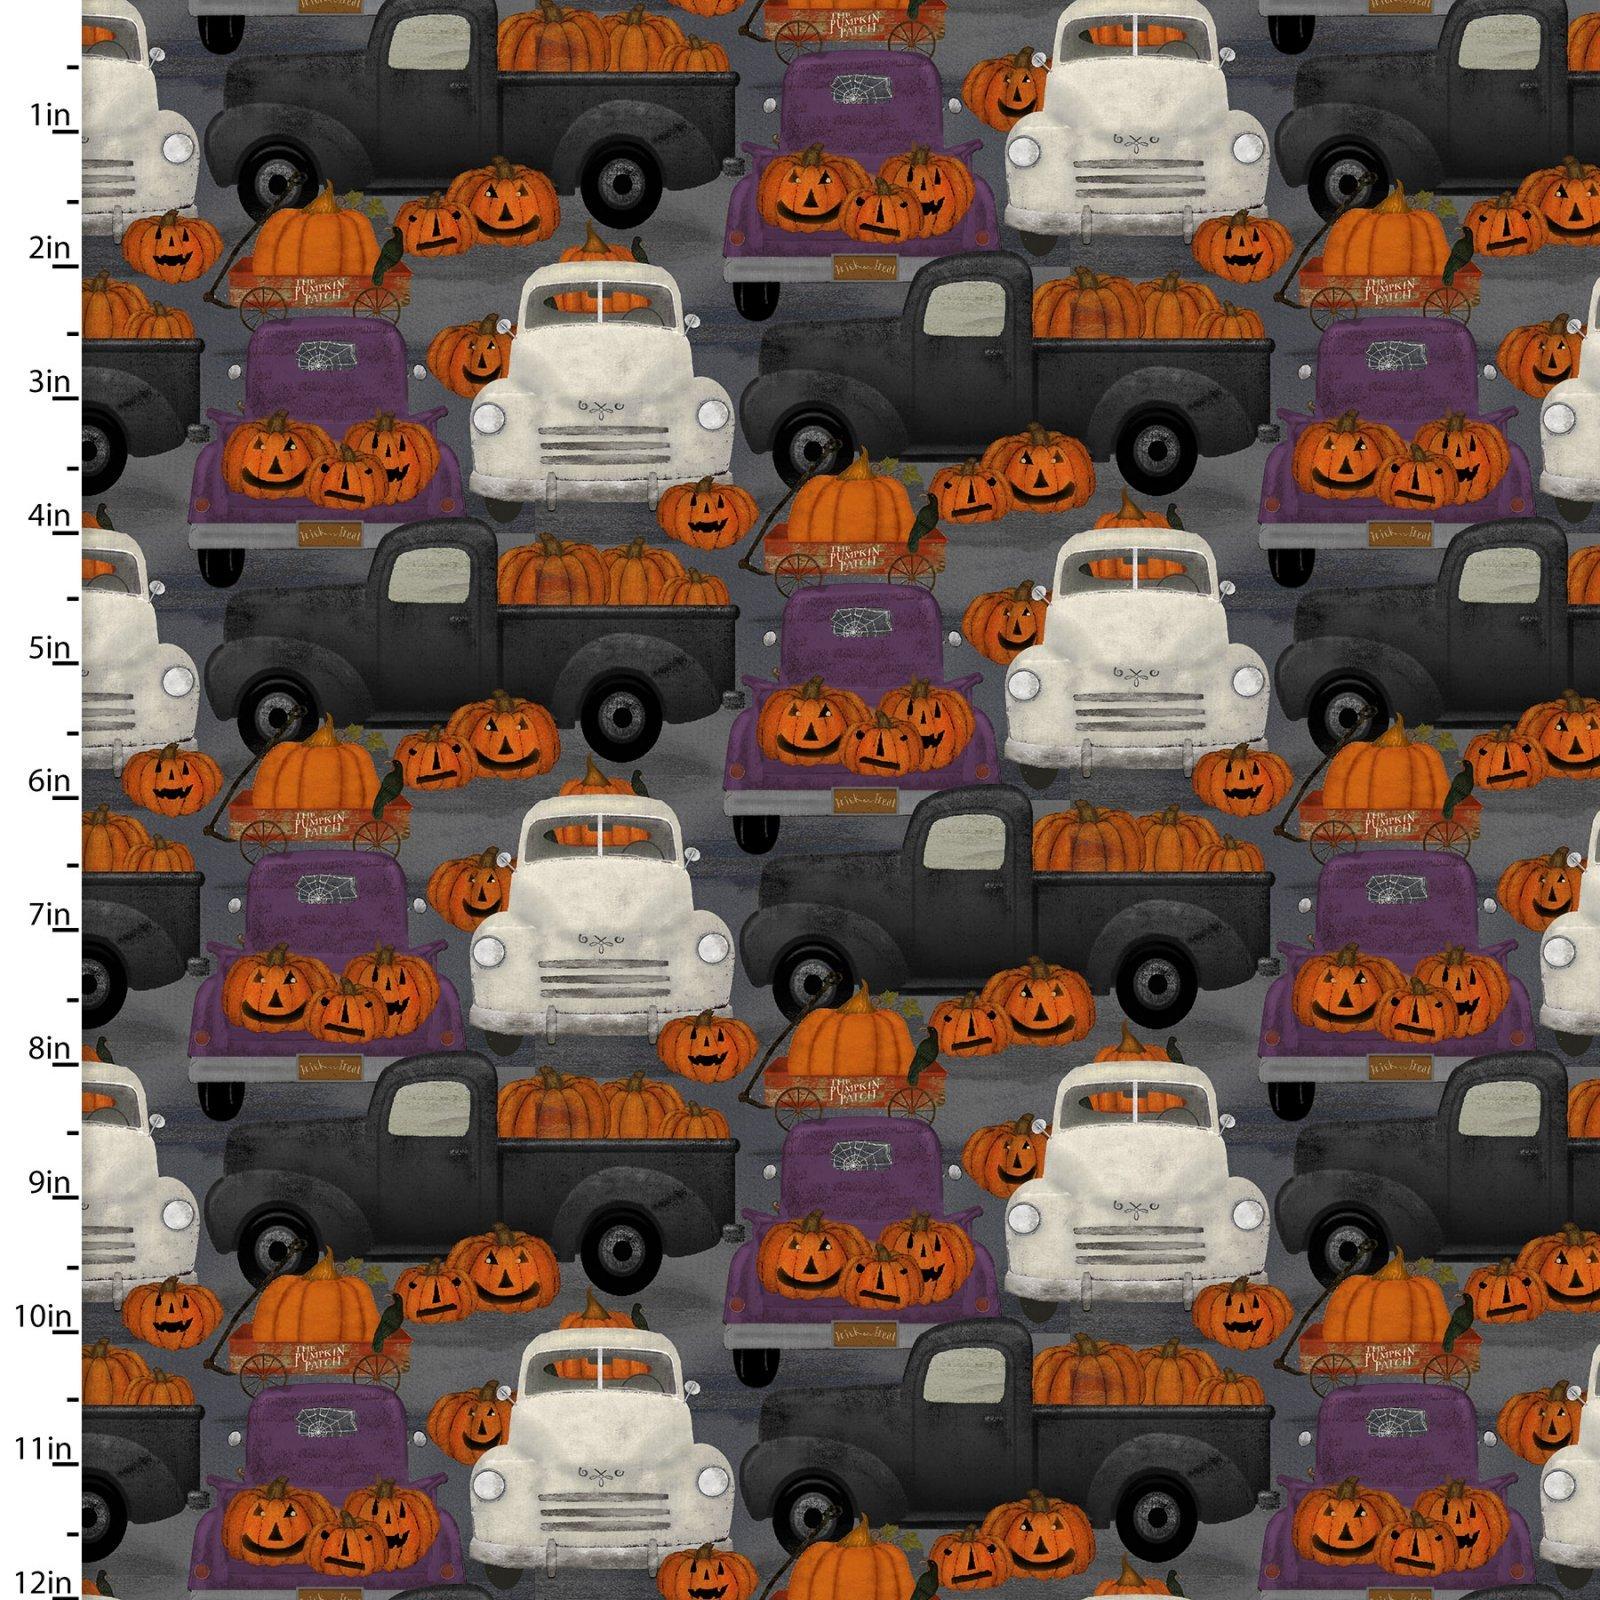 Spooky Night - Black & White Trucks